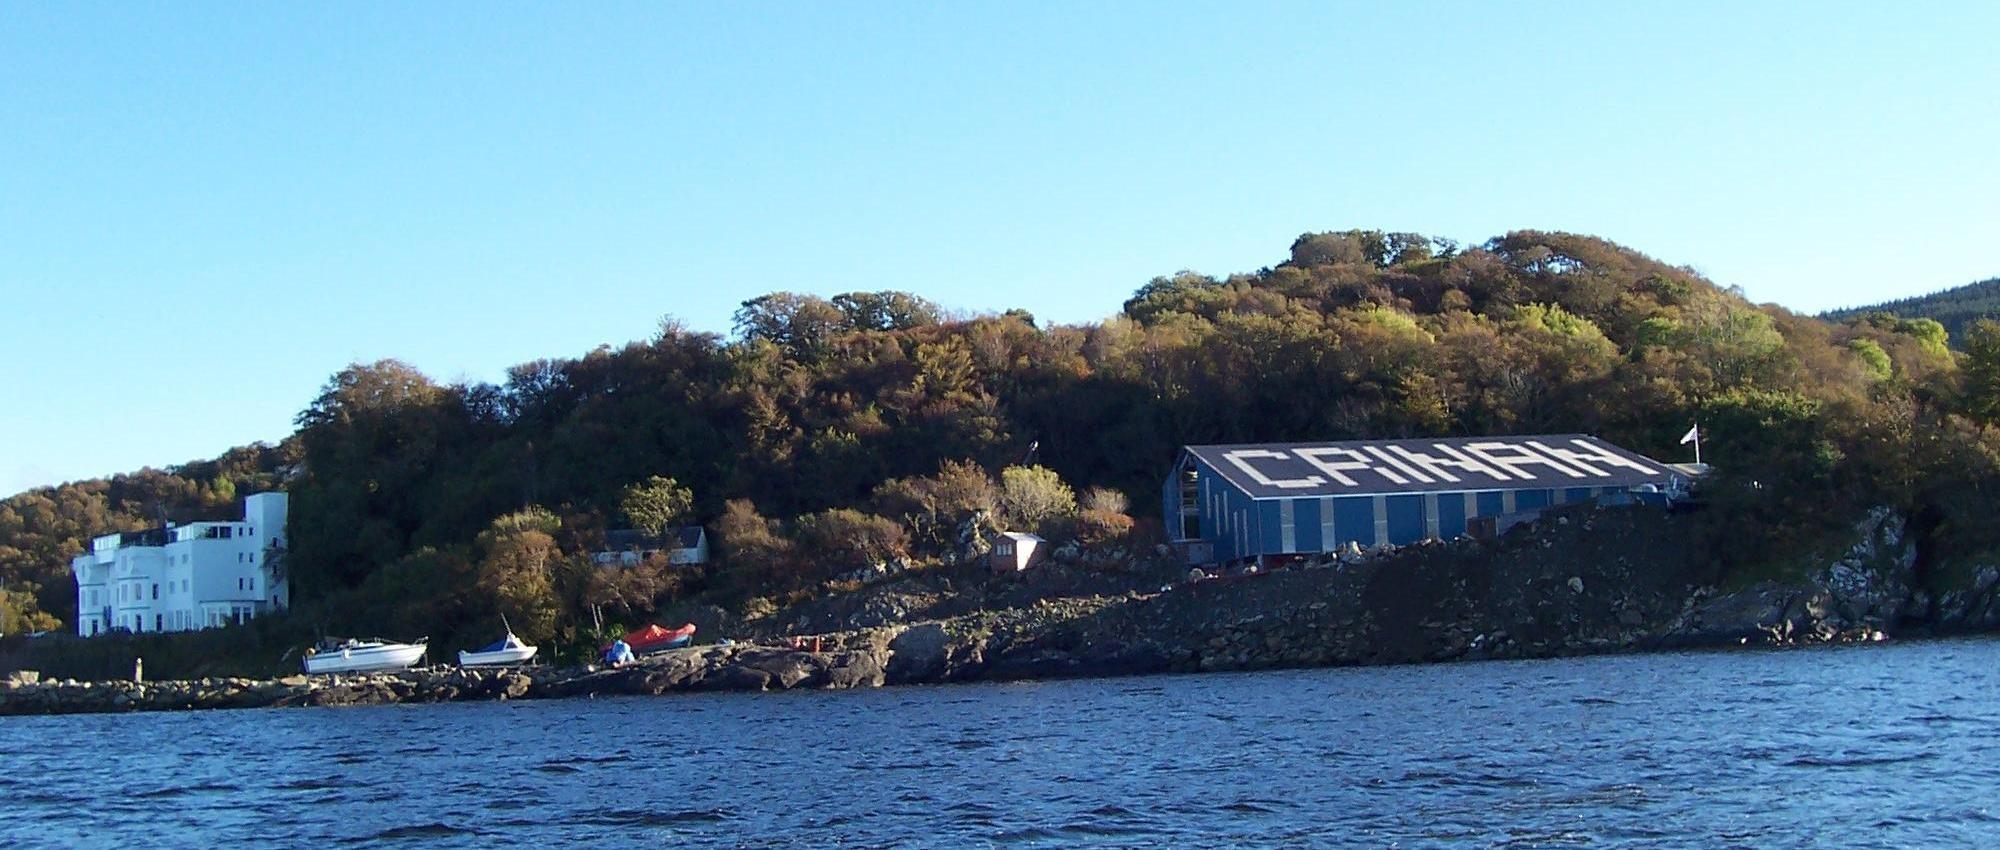 CBY-hotel-boatyard